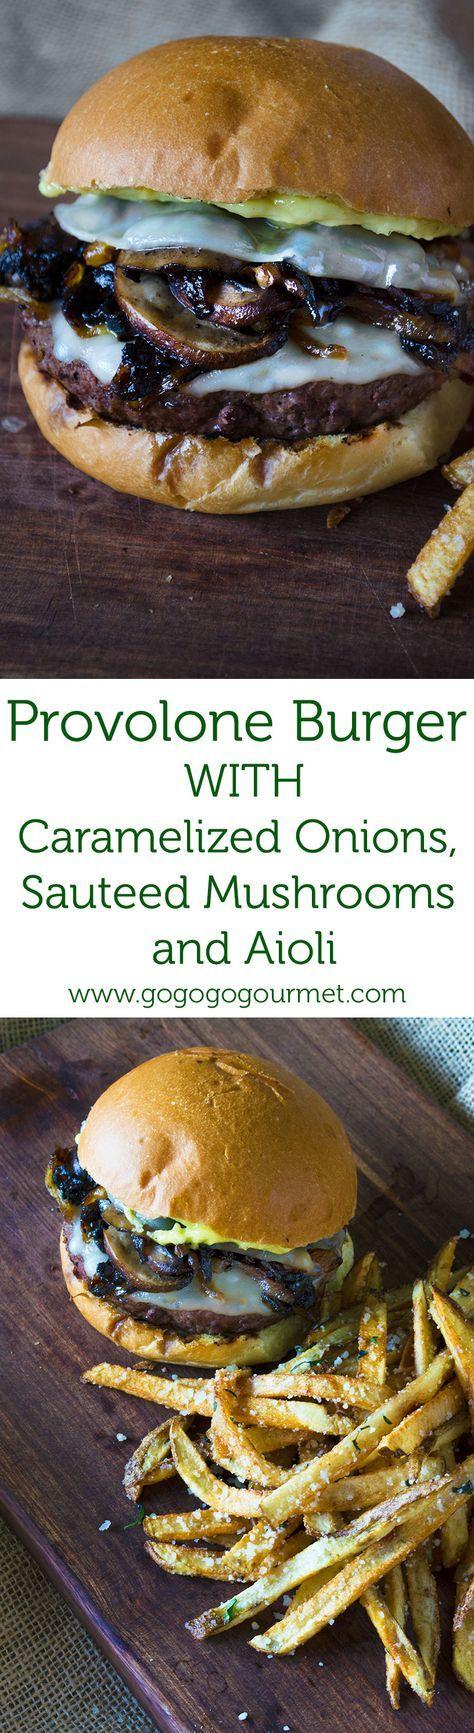 Mushroom Burger with Melted Provolone, Caramelized Onions and Aioli   Go Go Go Gourmet @gogogogourmet